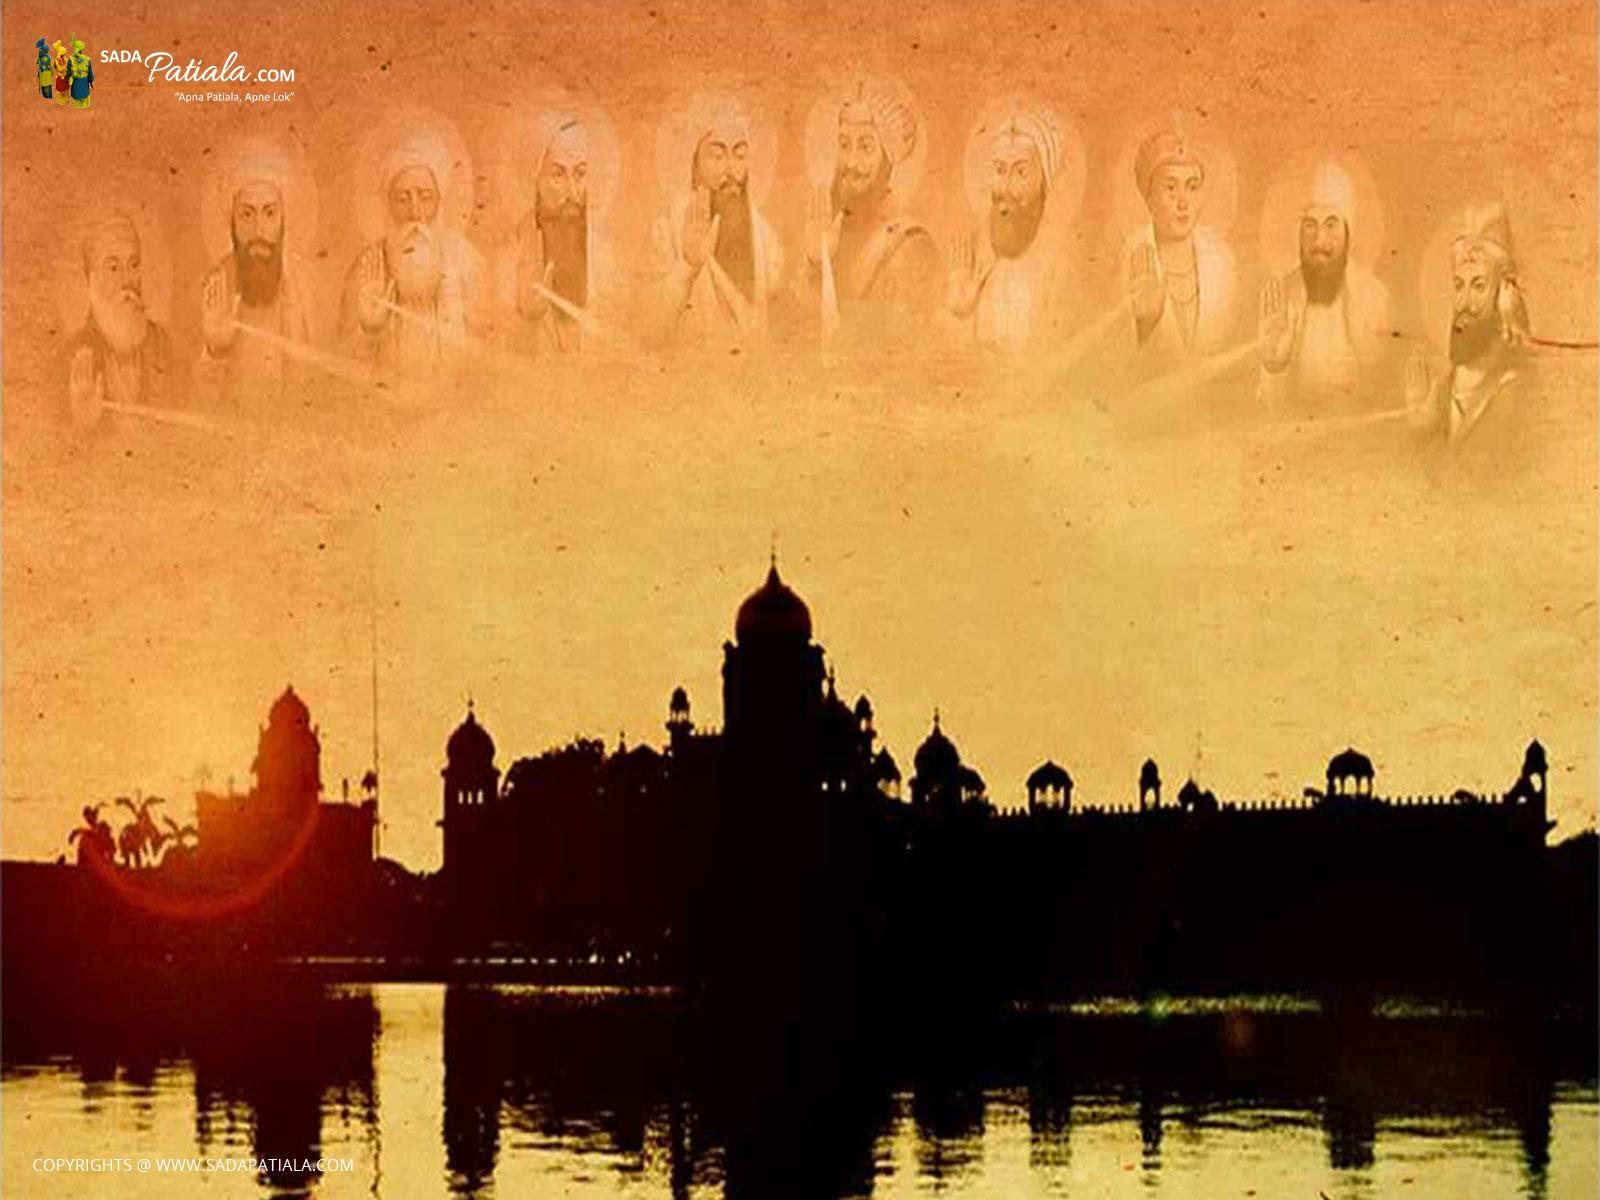 Gurudwara Dukhniwaran Sahib